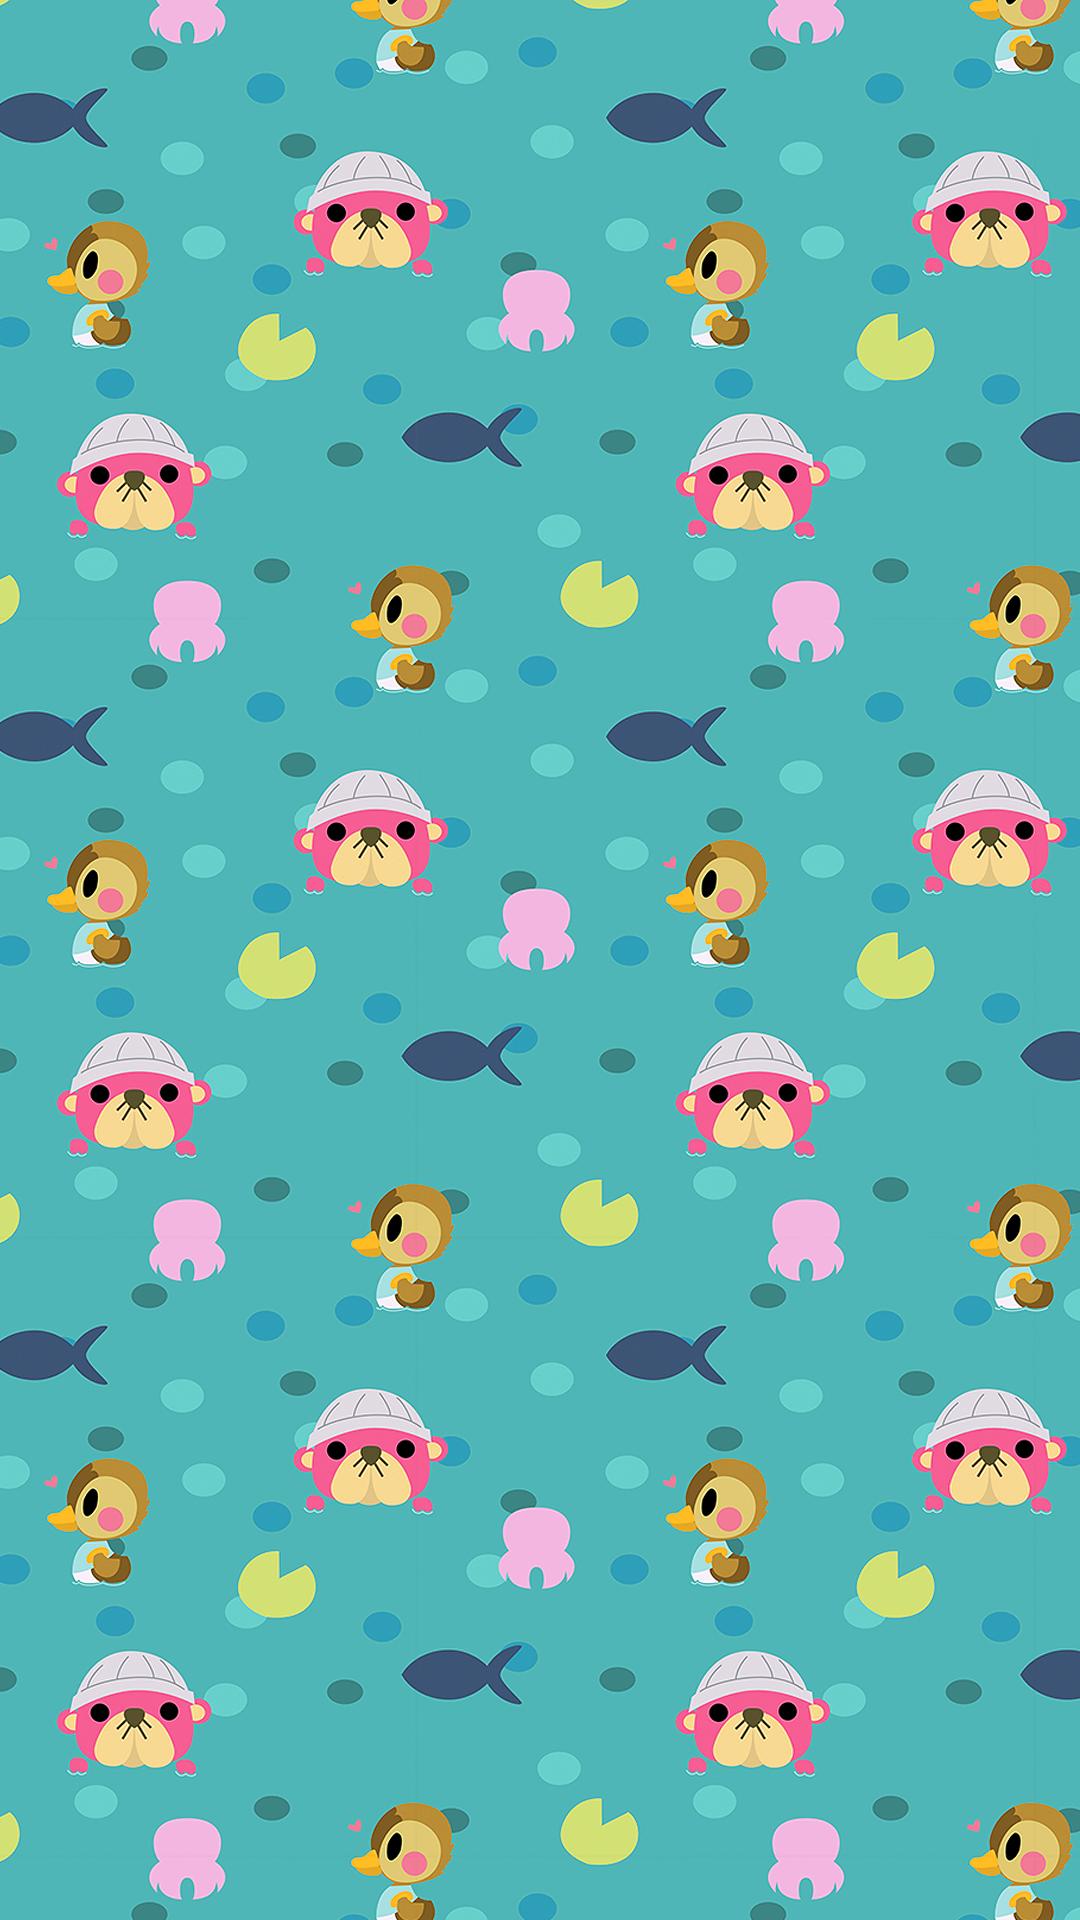 animal crossing new horizons desktop wallpaper hd